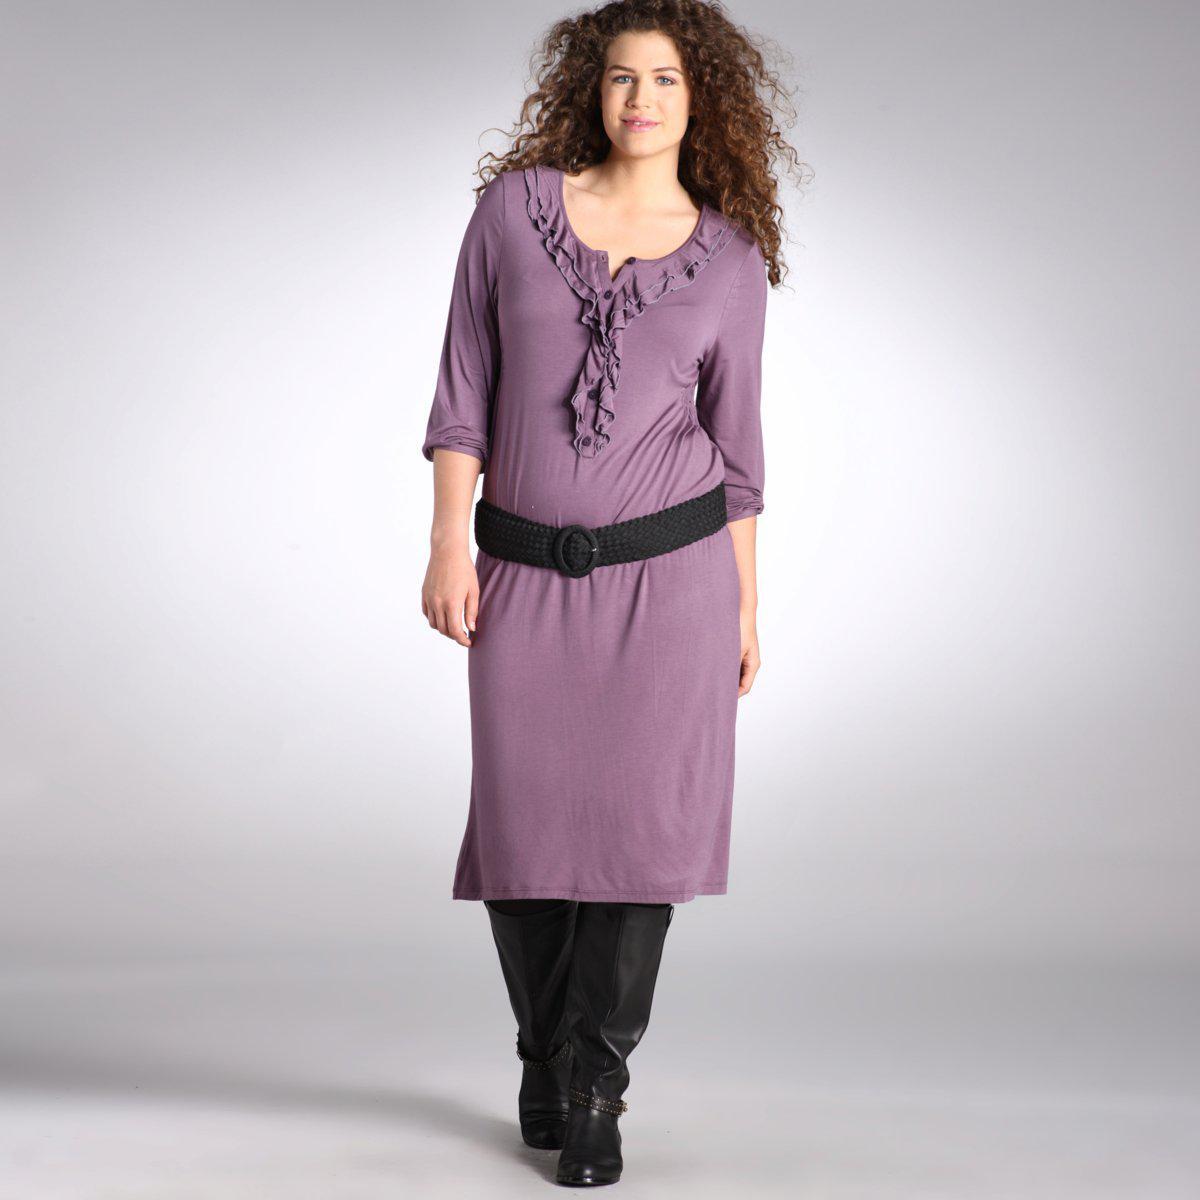 99eea3df2399 Βραδυνα Φορεματα LaRedoute Φθινόπωρο 2011 Κωδ. 324205338